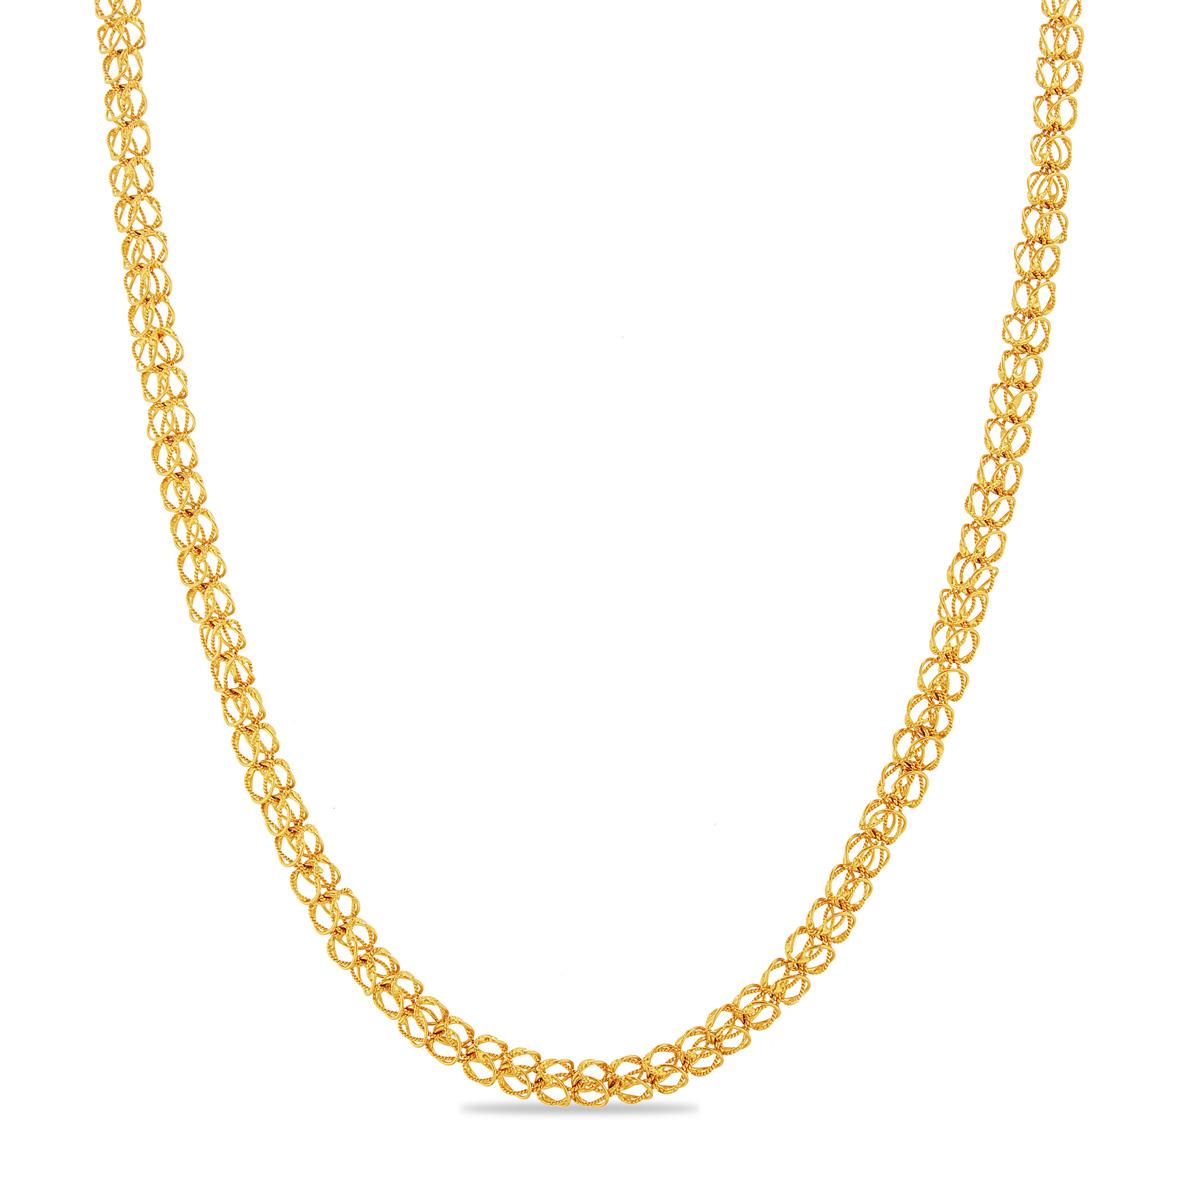 Men's Gold Chain